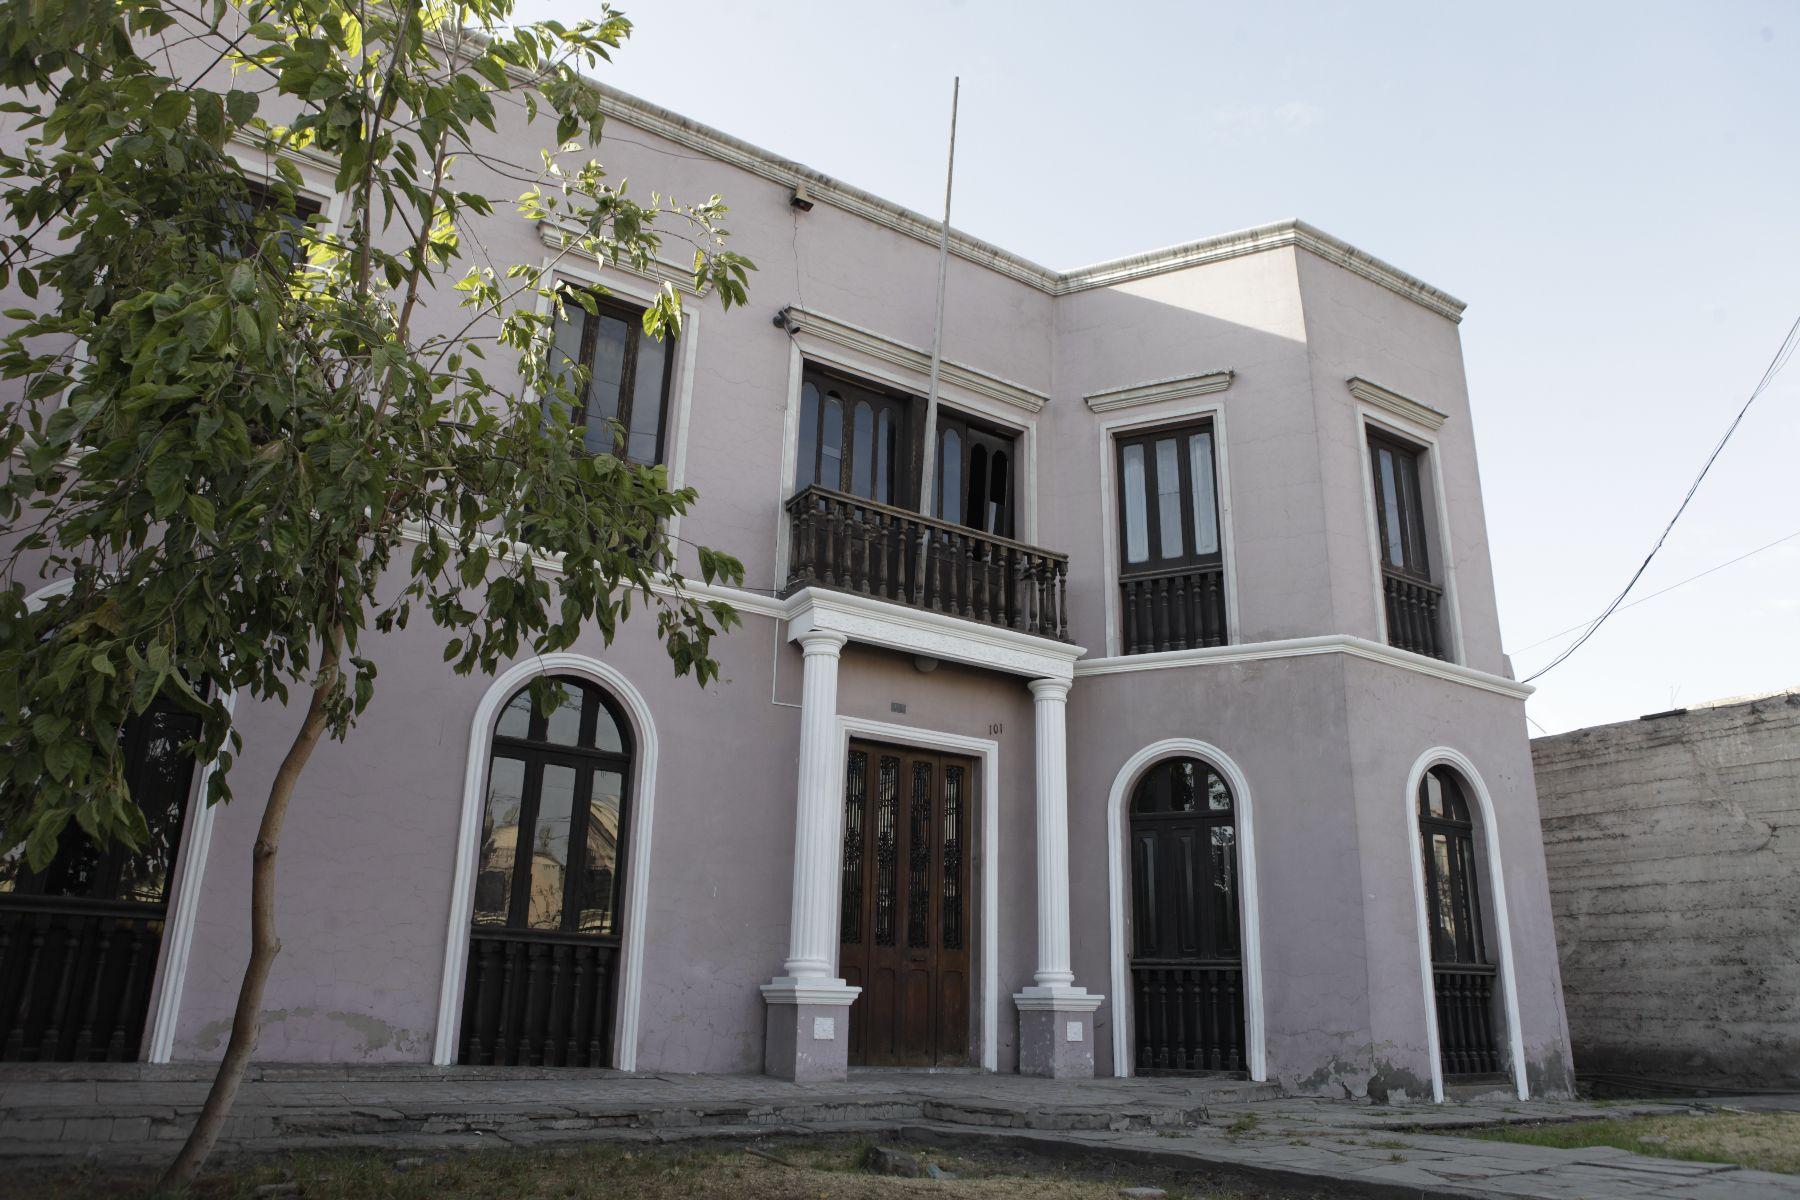 Museo Vargas Llosa, Arequipa, Perú. Foto: andina.com.pe